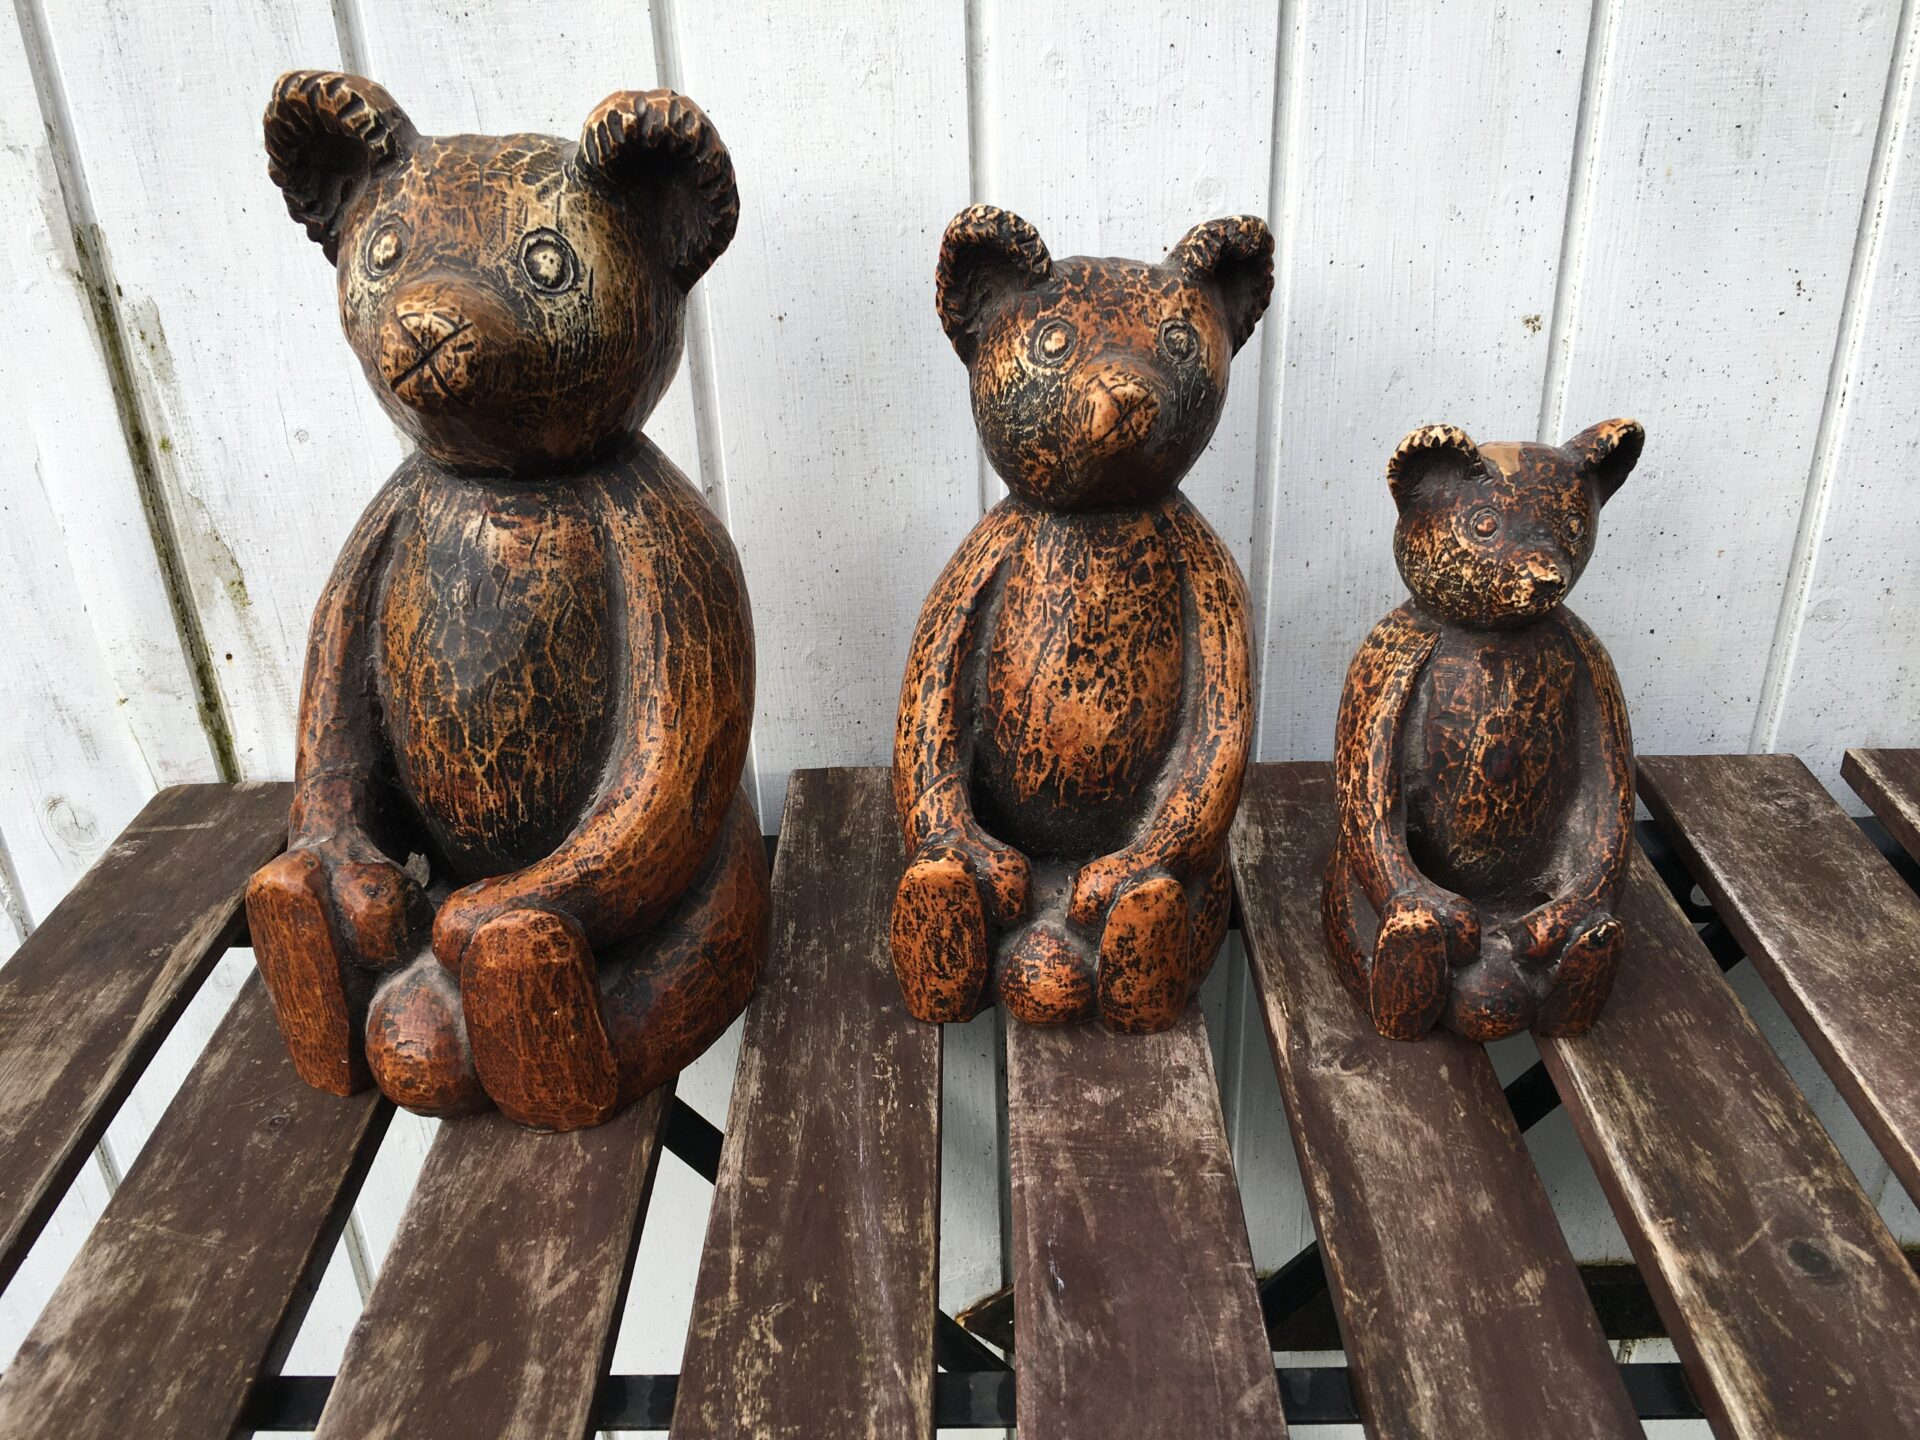 3 stk Stickland Bear, h= 28/22/17 cm, samlet pris 500kr